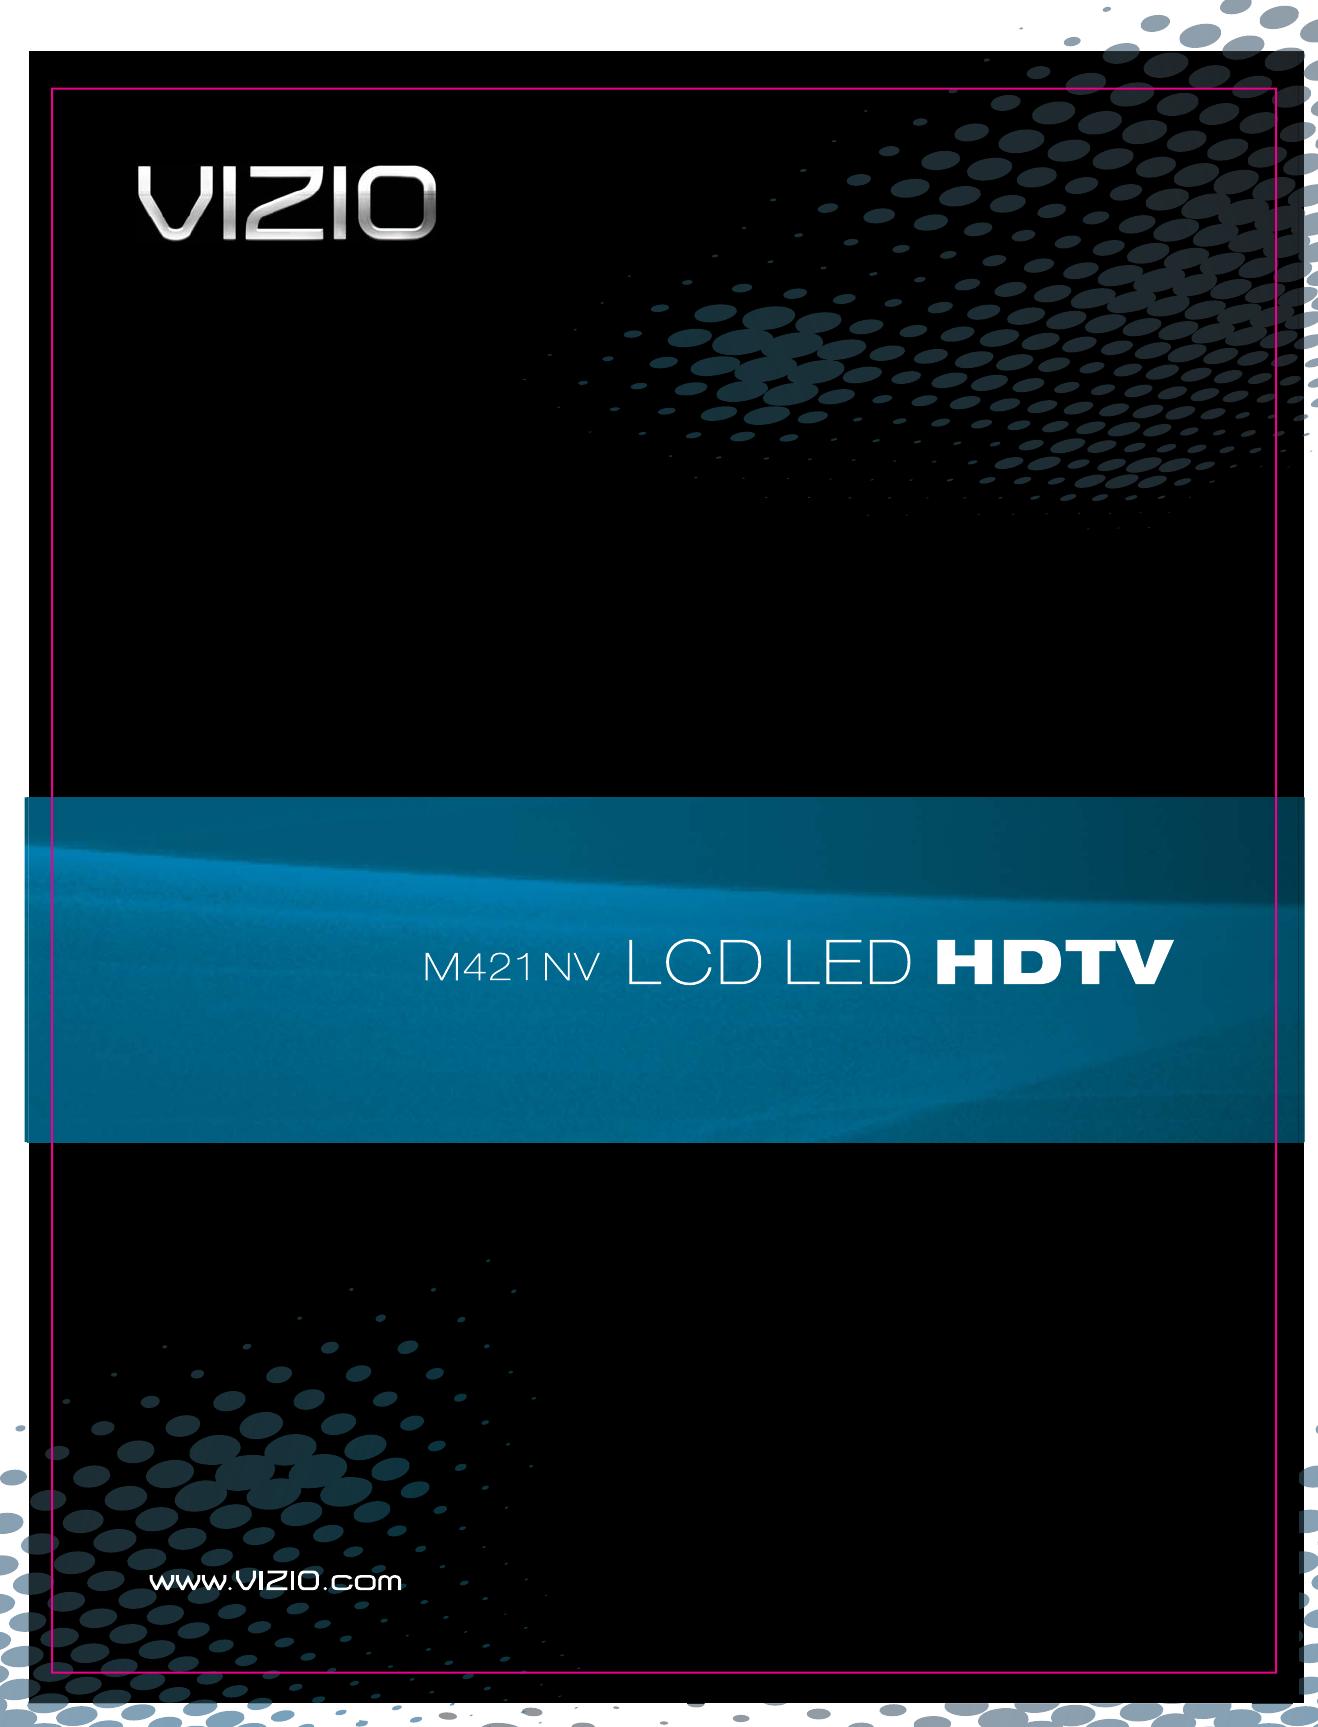 Vizio M421Nv Users Manual 10 01135 M420NV User Manual_2